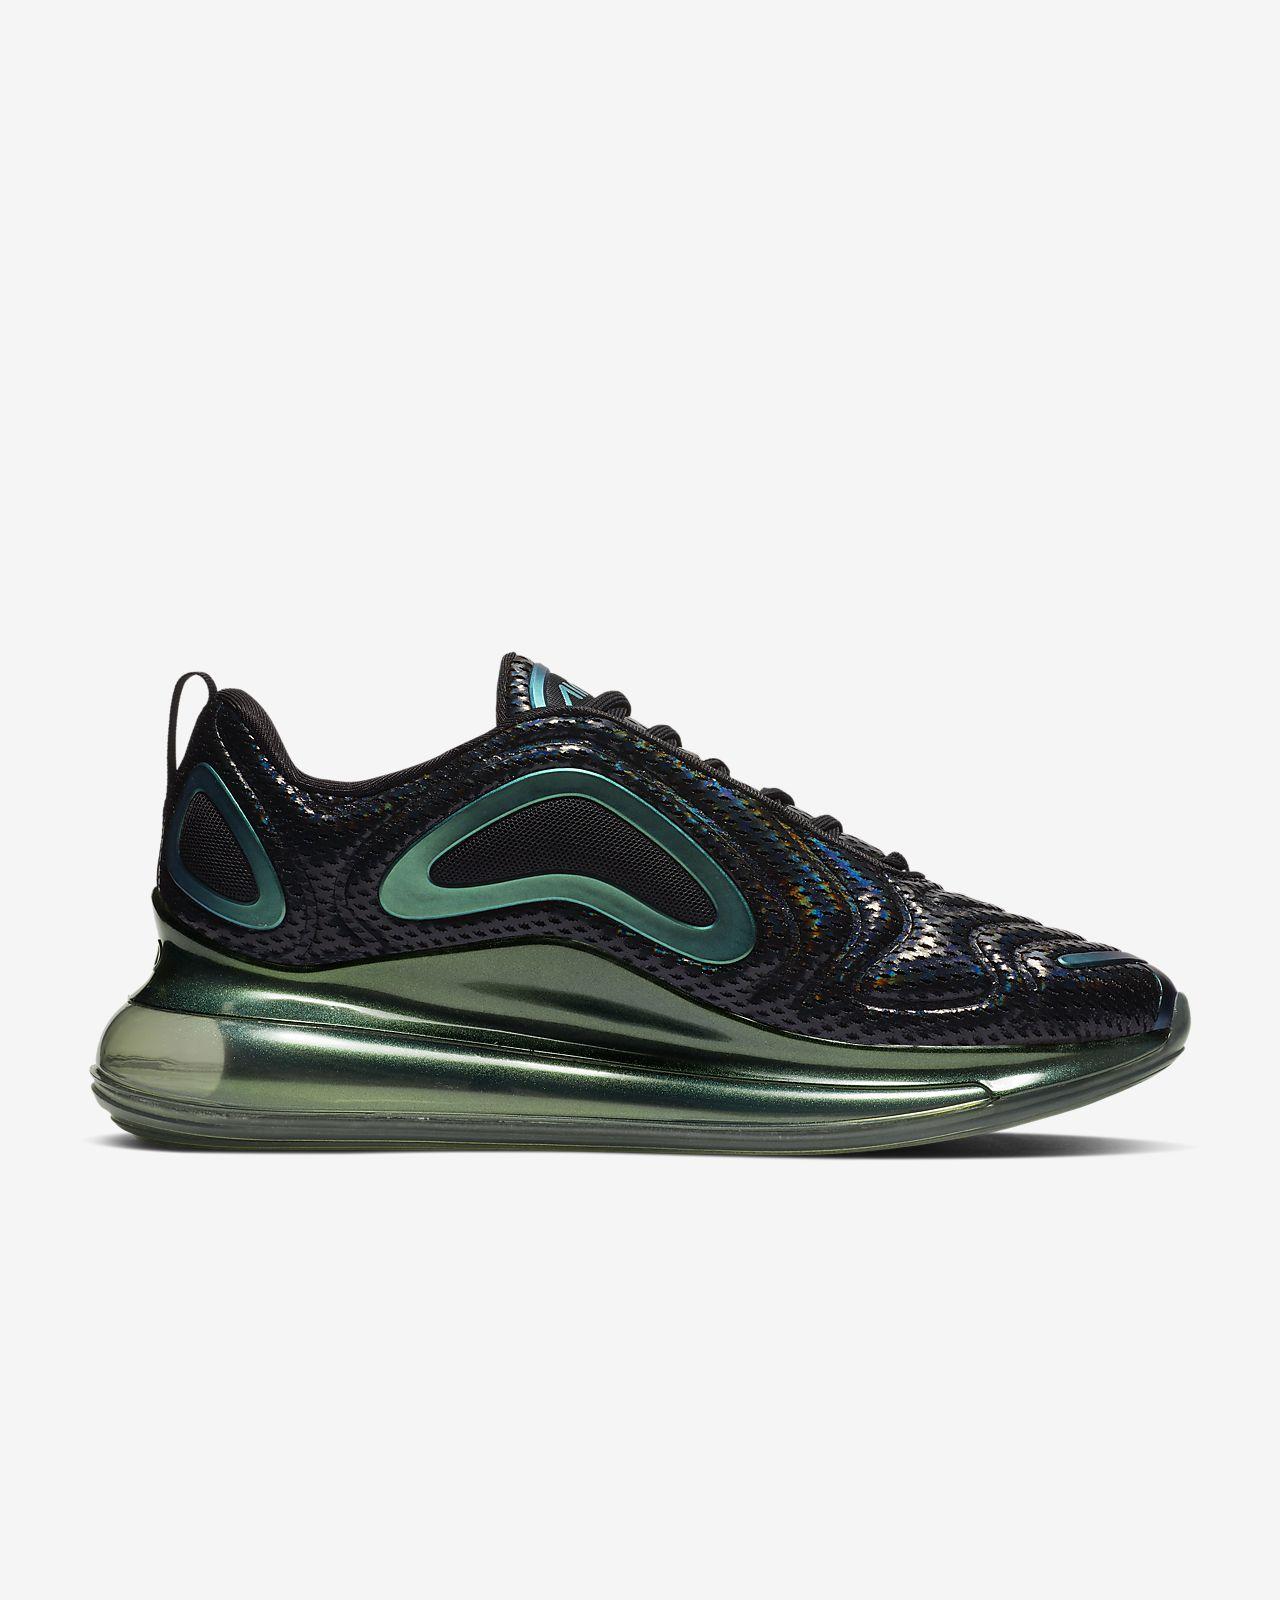 best loved 0a017 5e31a ... Nike Air Max 720 Men s Shoe